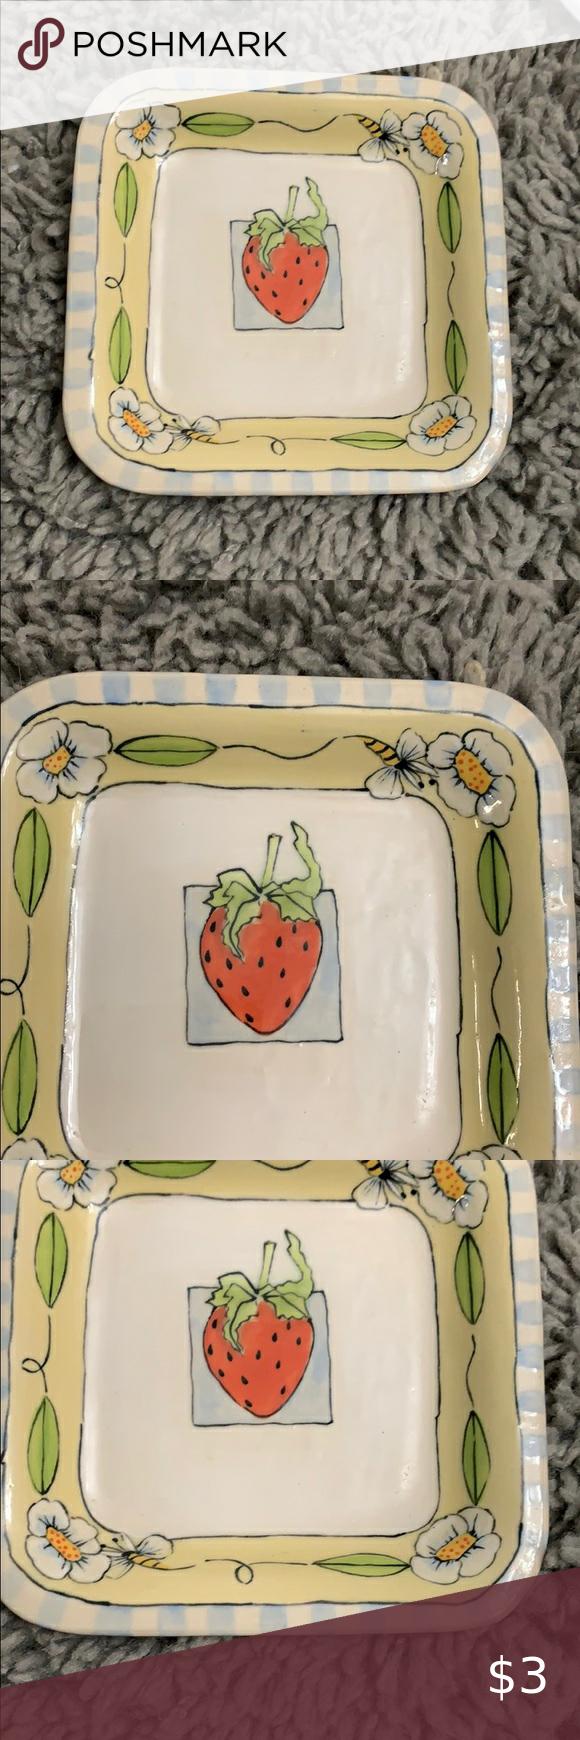 Photo of $3 sale!! $10 minimum Cute little dish !!  $3 sale minimum purchase $10 Please t…